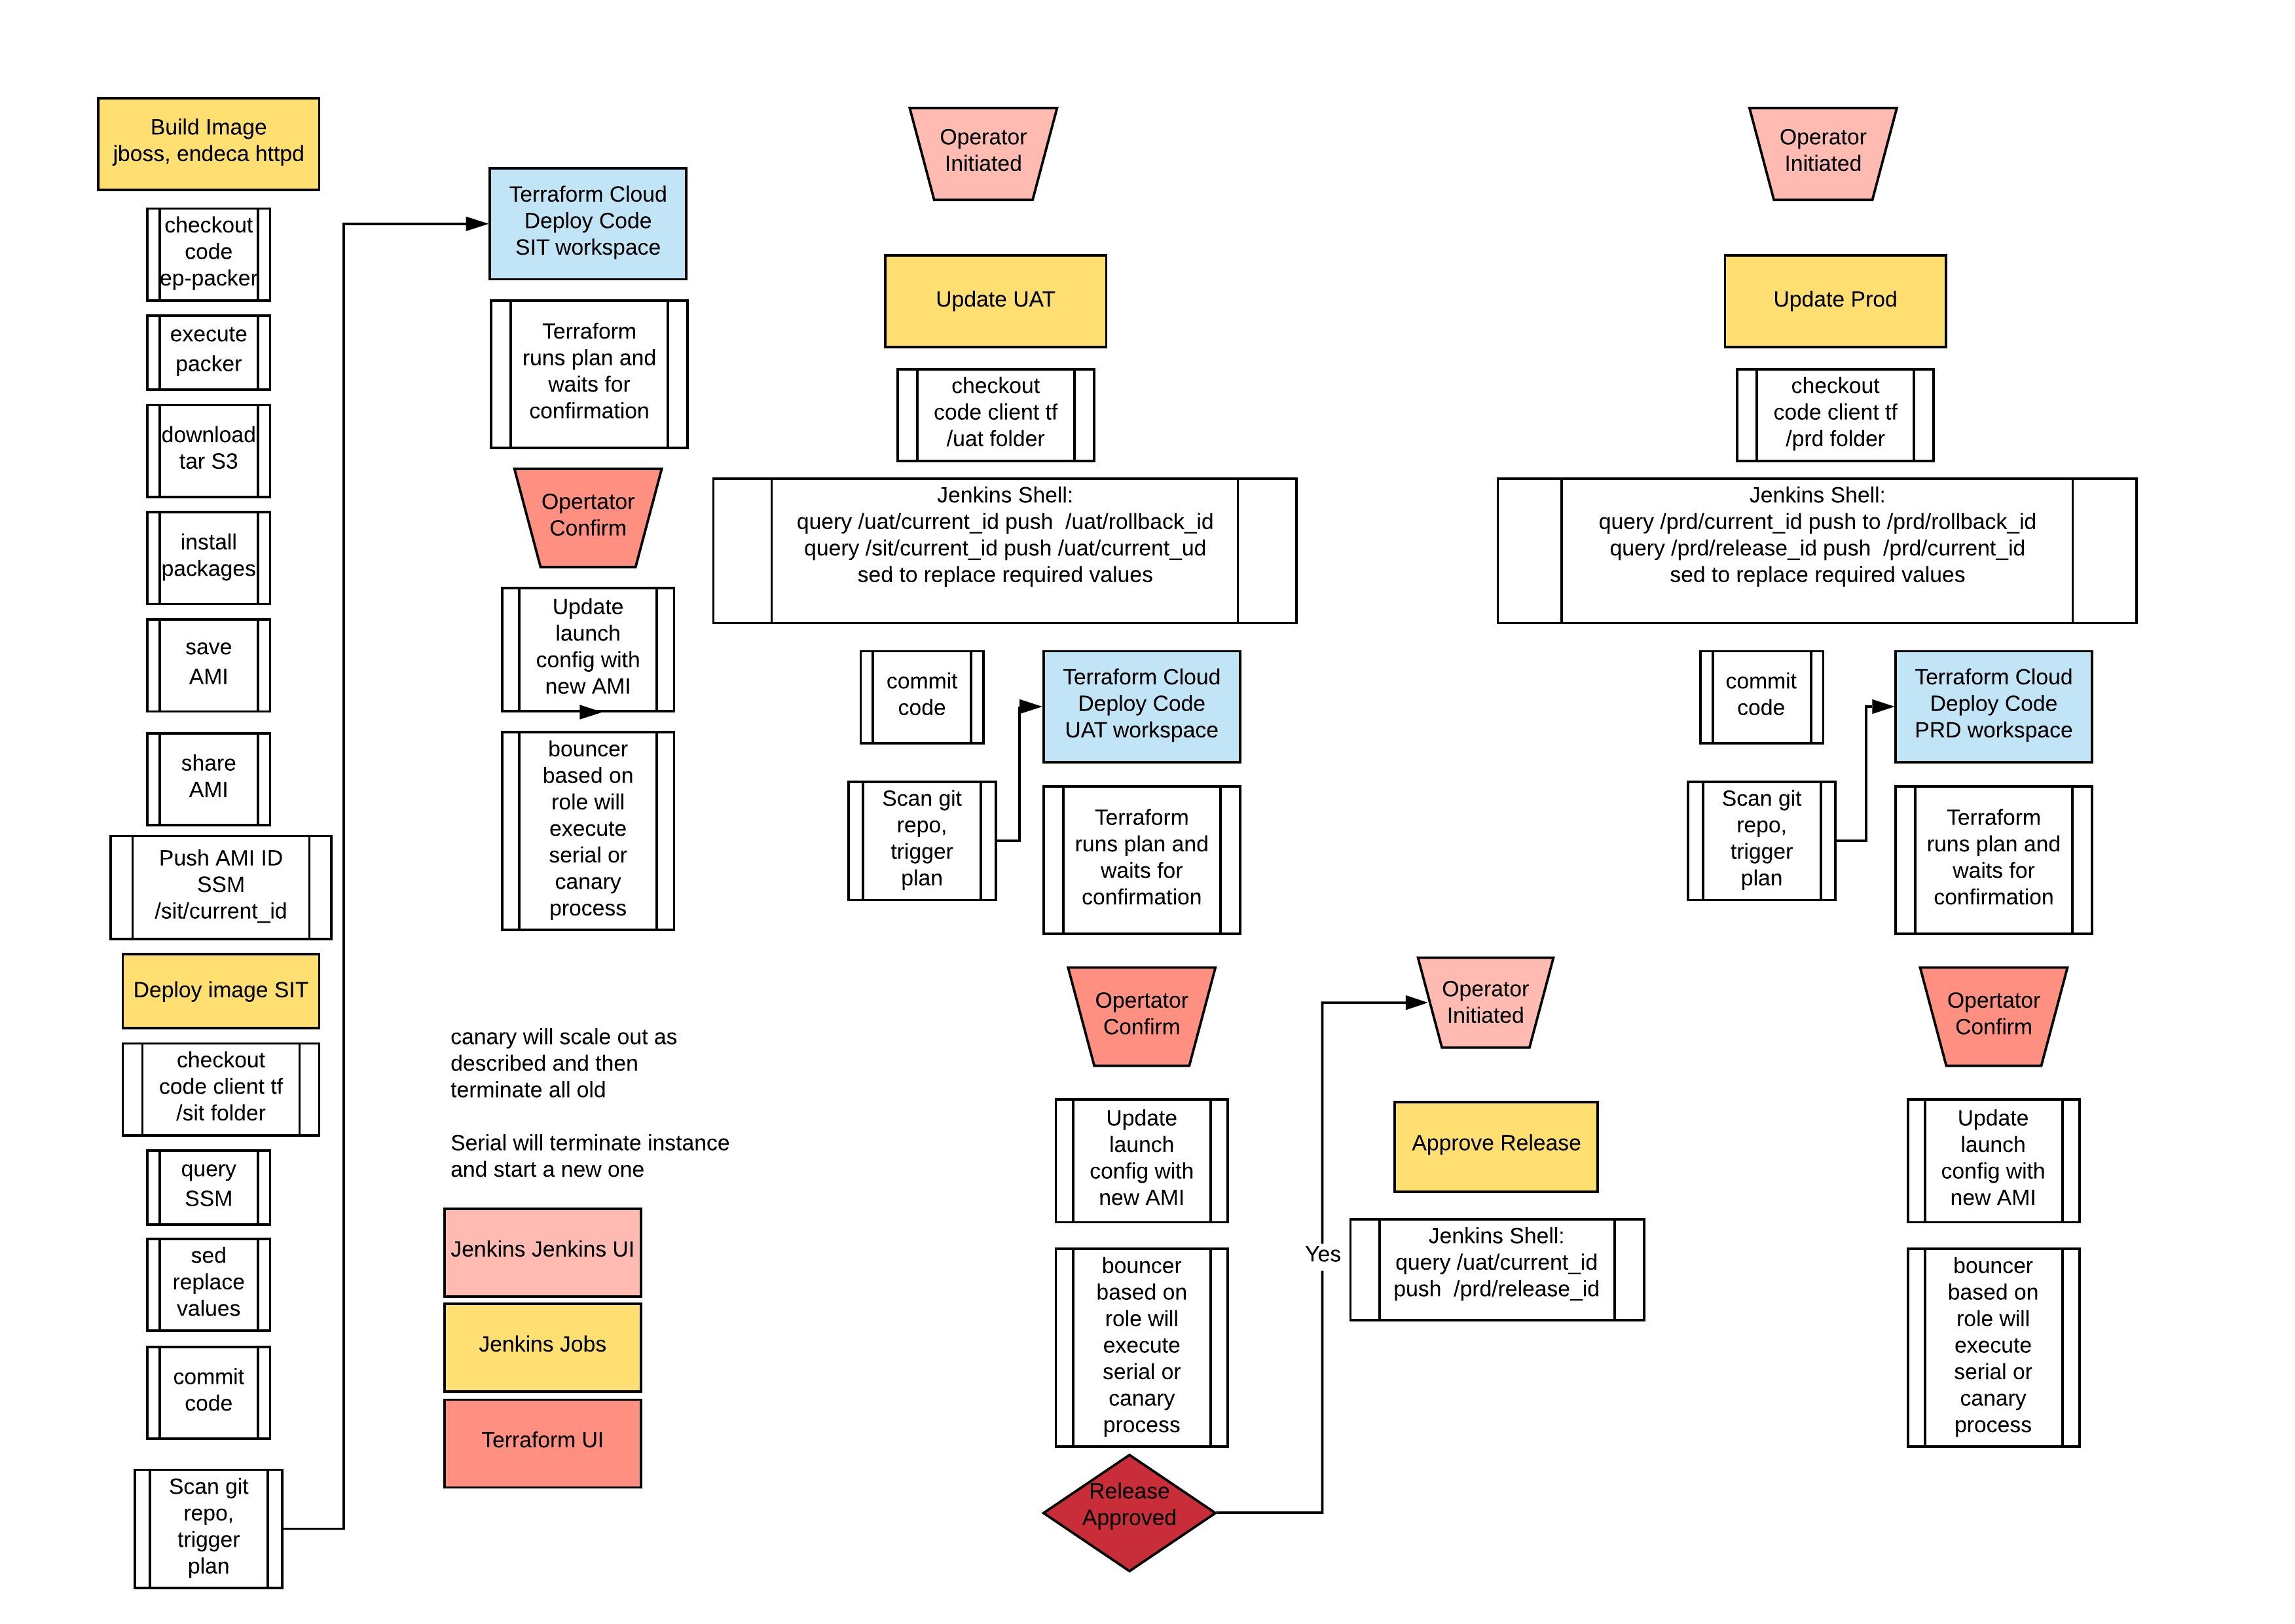 AMI Image Process